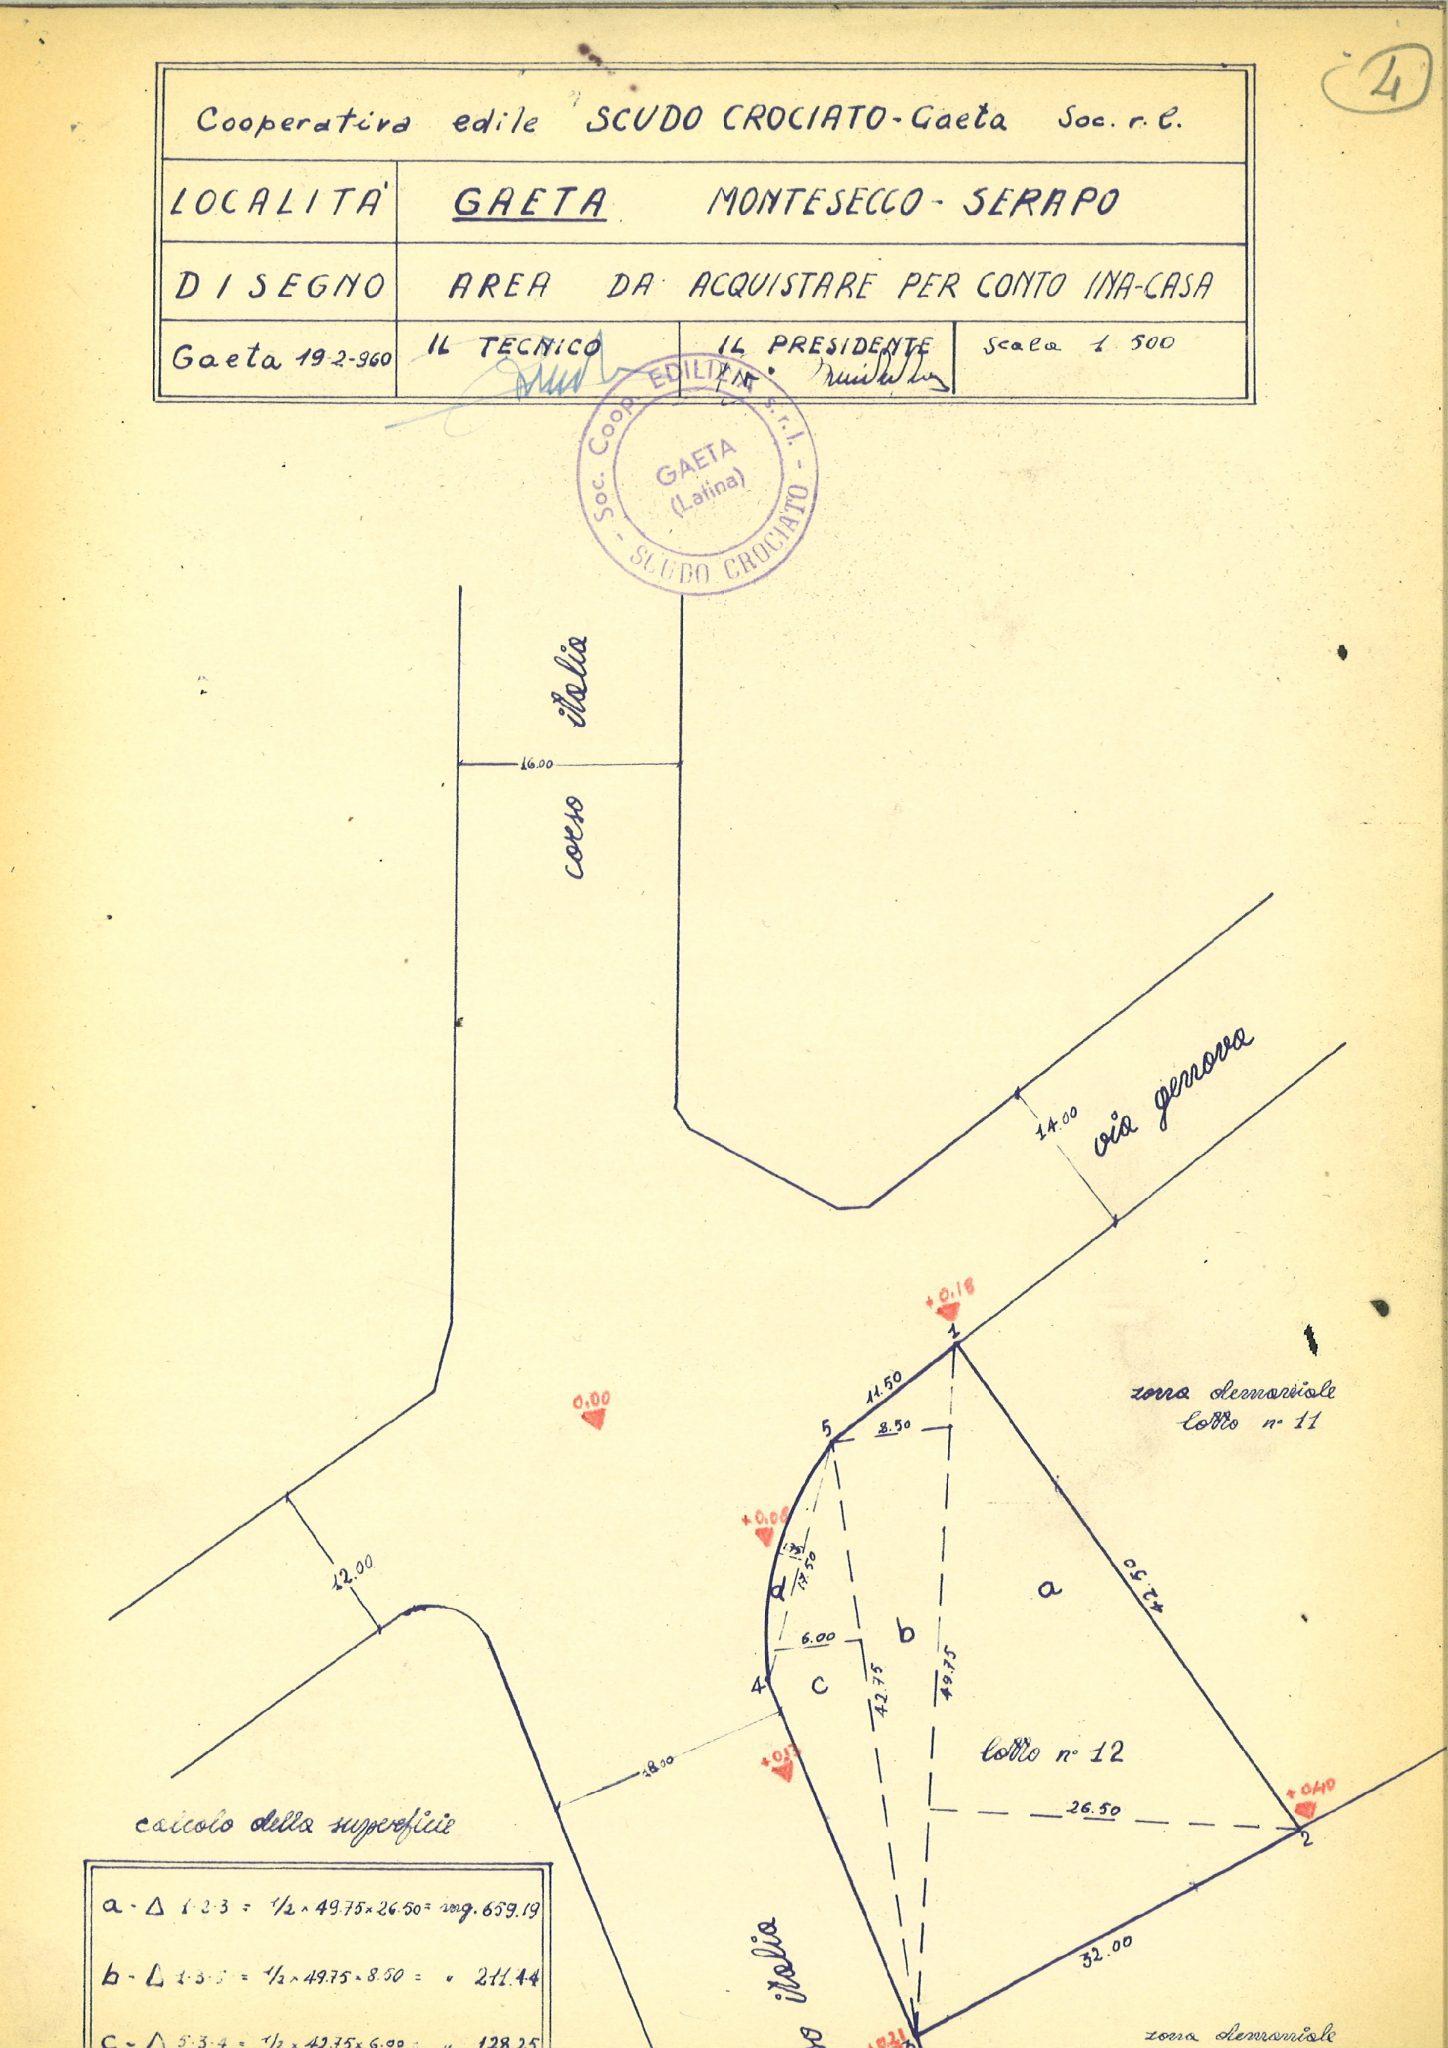 Measurement of area for INA-Casa constructions (Gaeta, 1960)